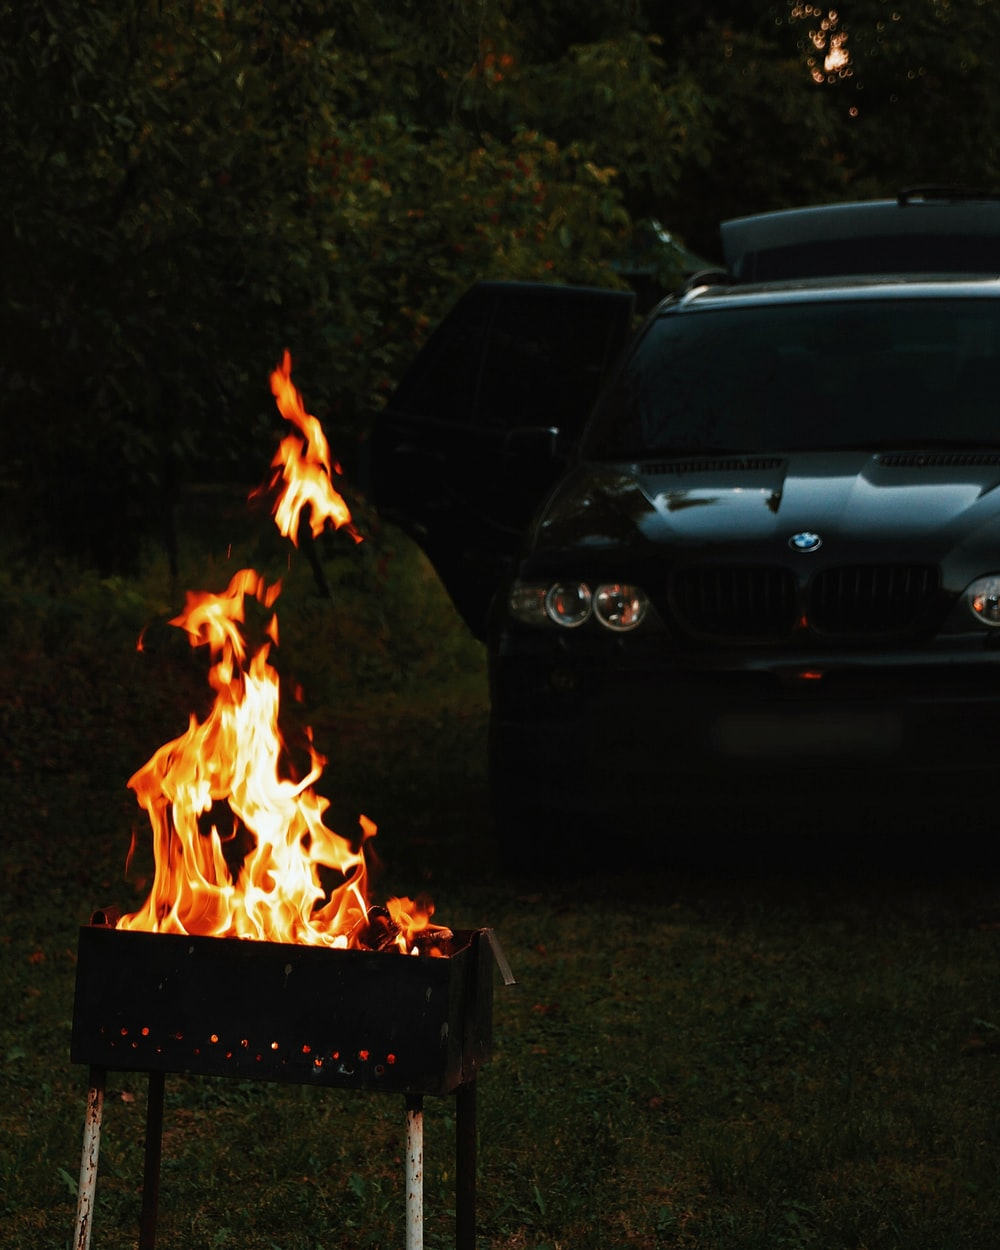 vehicle near grill